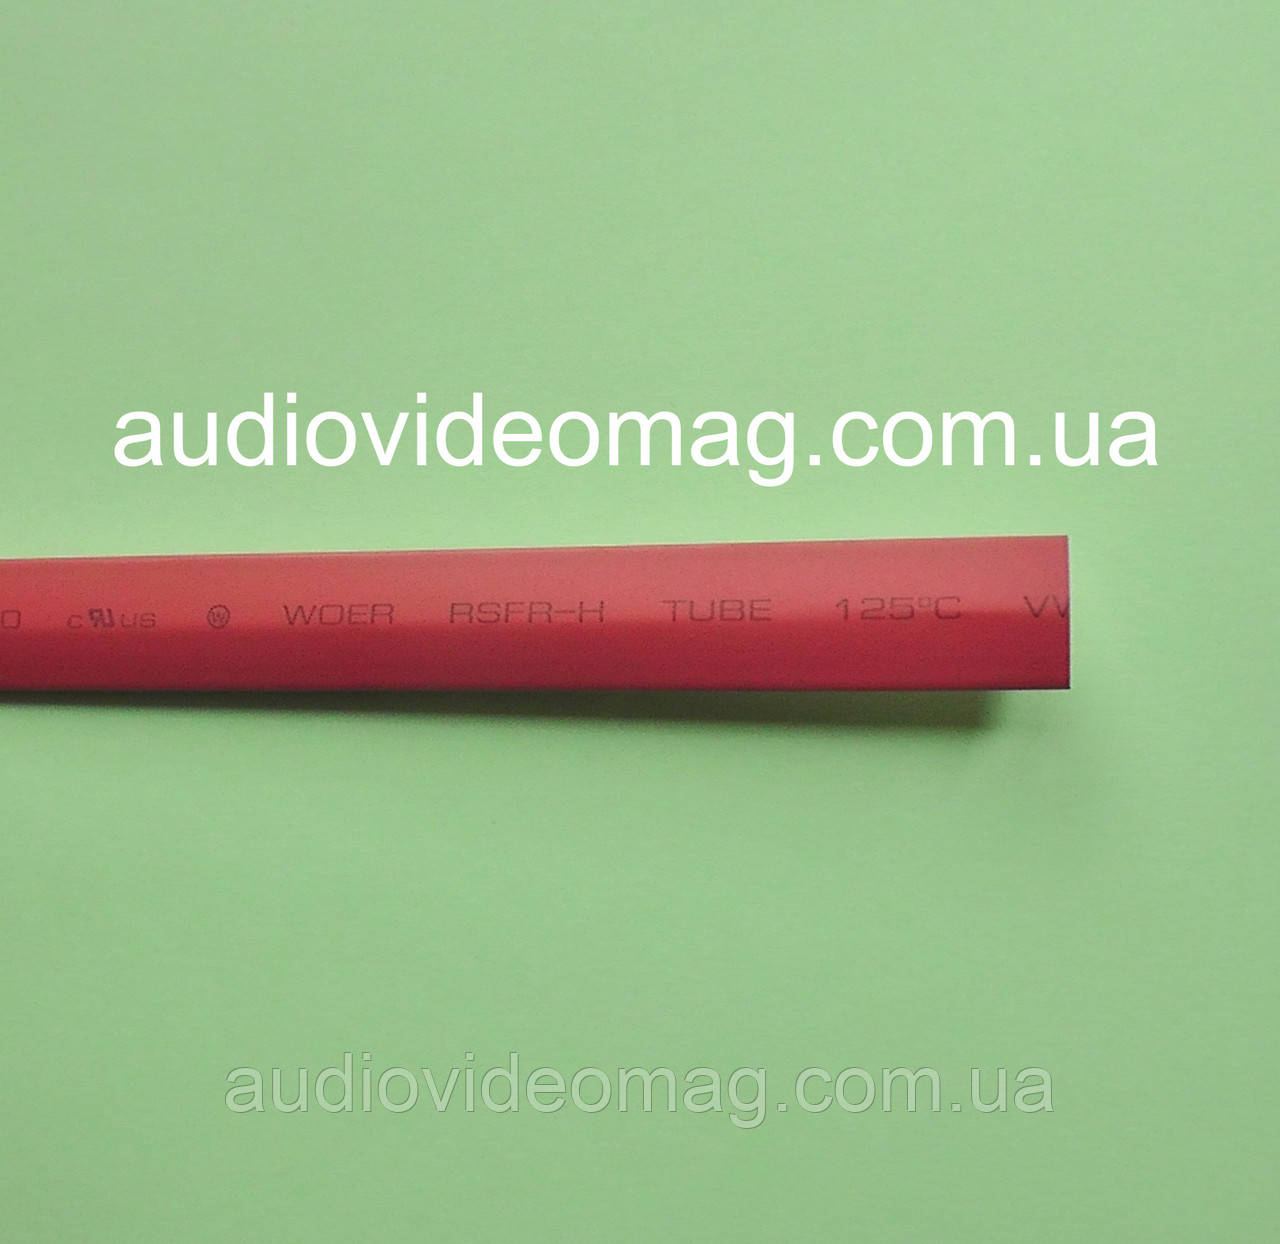 Термоусадочная трубка (2:1) - 8.0/4.0 мм, 1 метр, красная